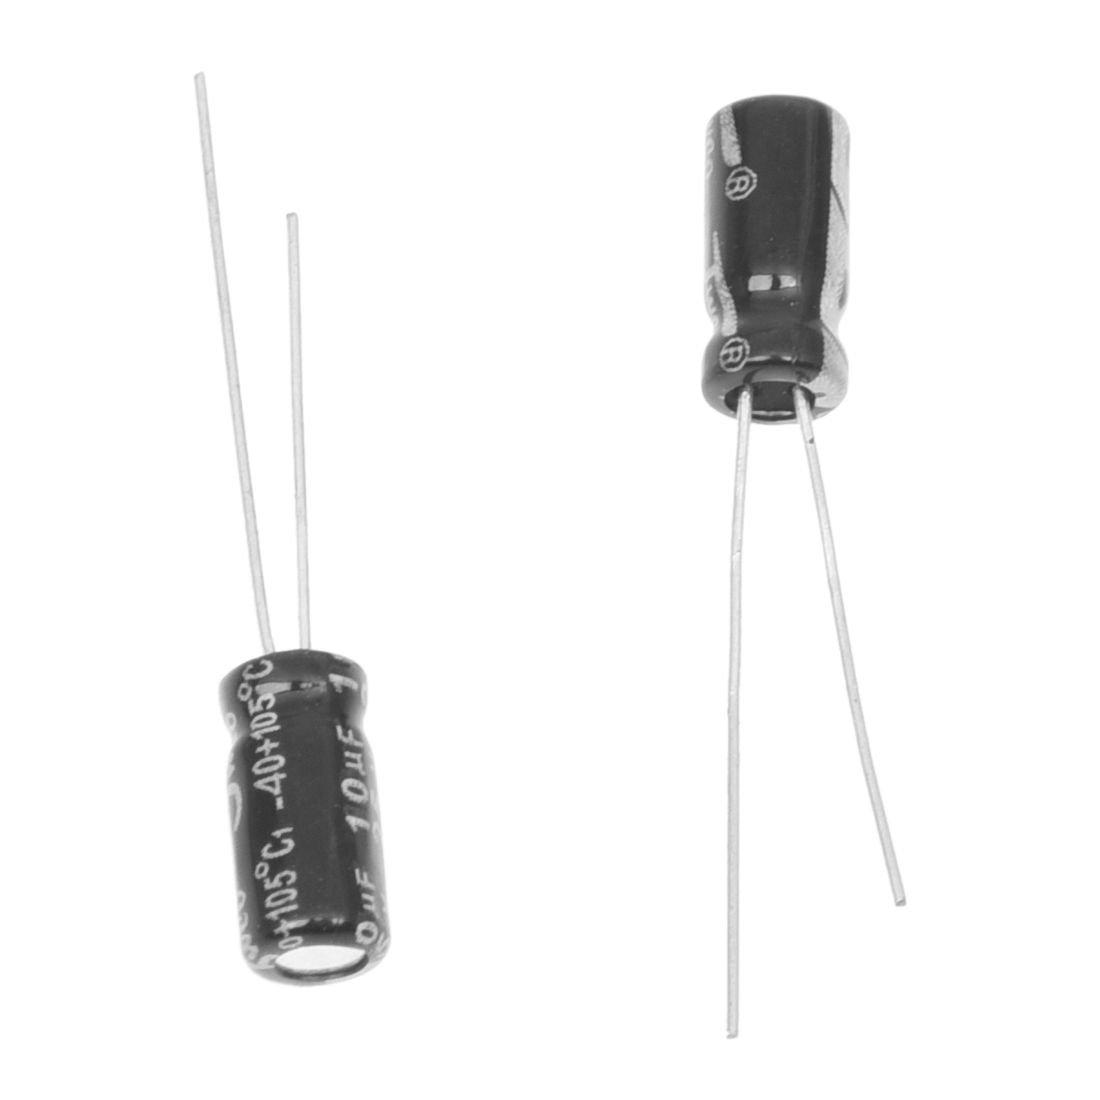 SODIAL 10uF 25V Radial Lead Aluminum Electrolytic Capacitors 100 Pcs R